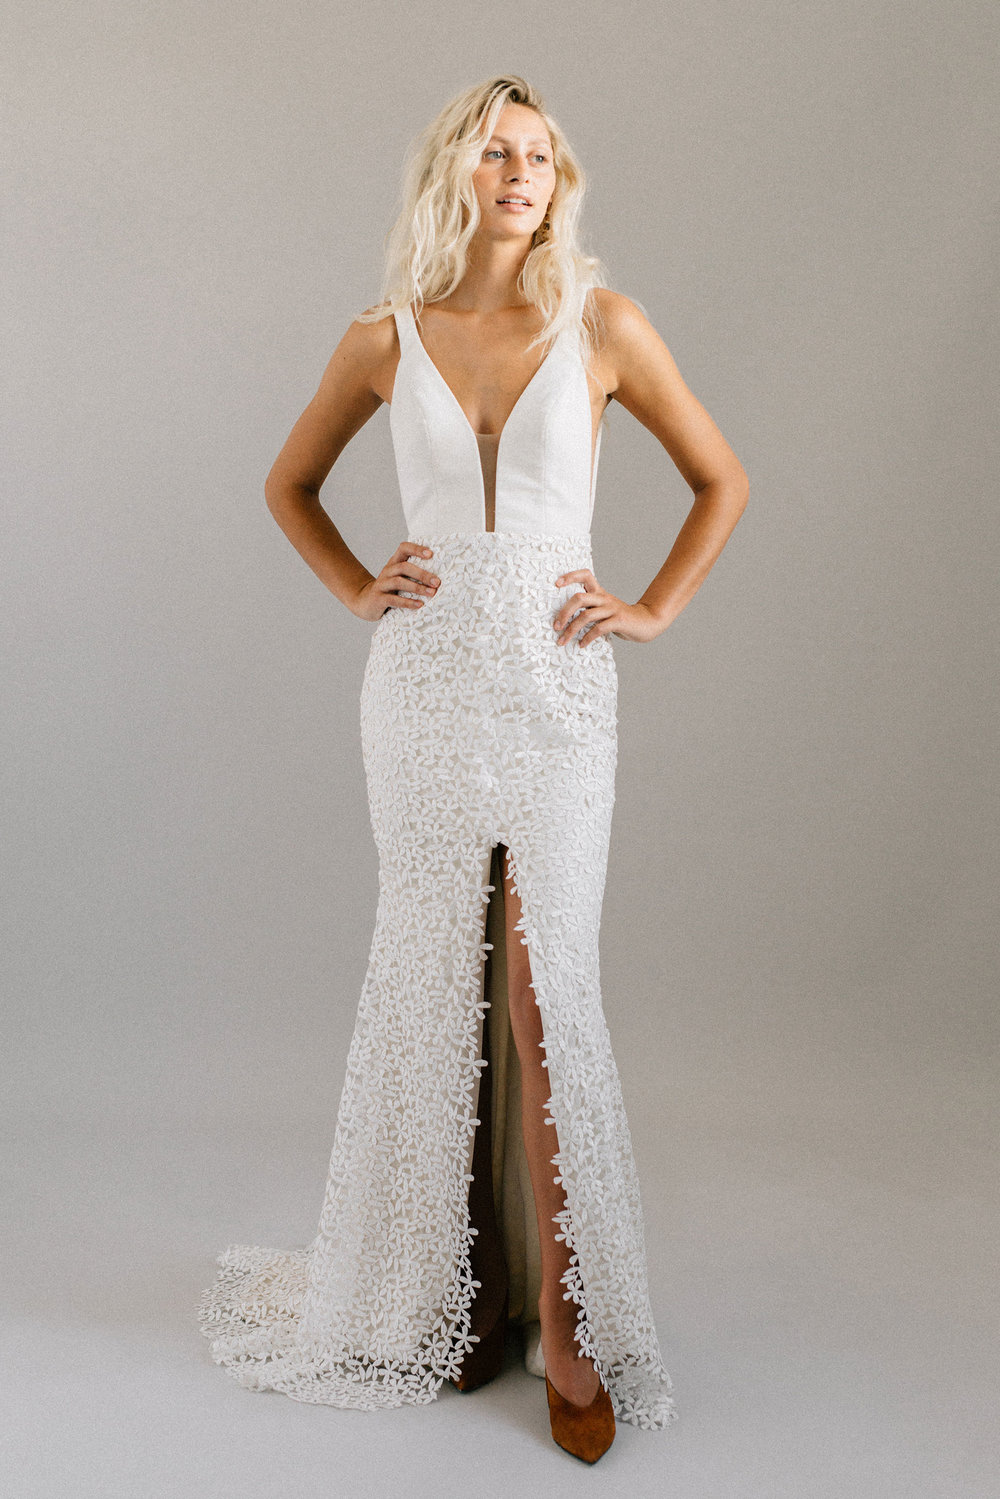 ottawa-wedding-dress-westboro-bridal-store-modern-bride-boutique-revelle-laudae-Lupine-PS2.jpg